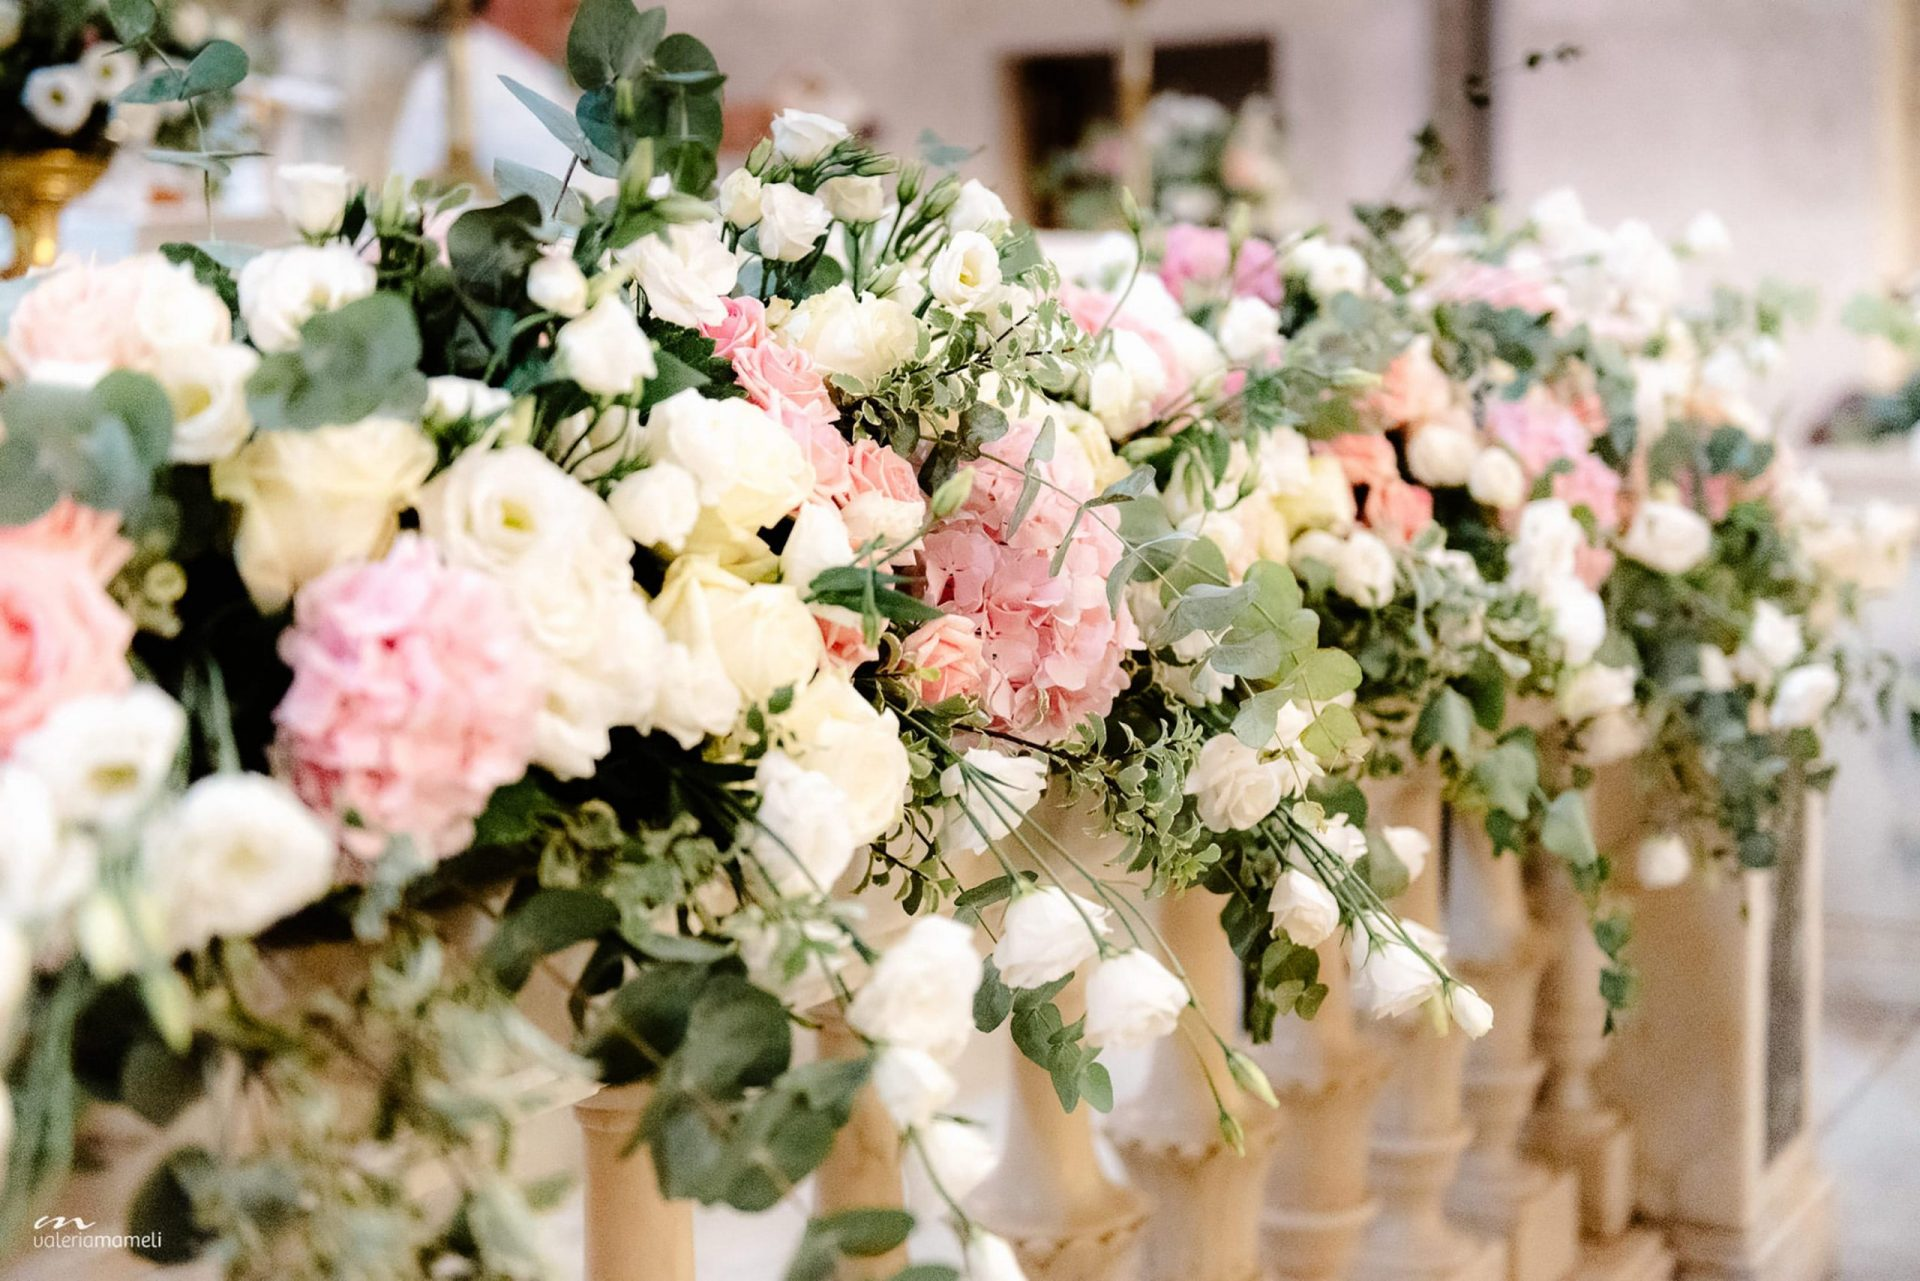 Francesca and Francesco, pastel tones flower arrangements